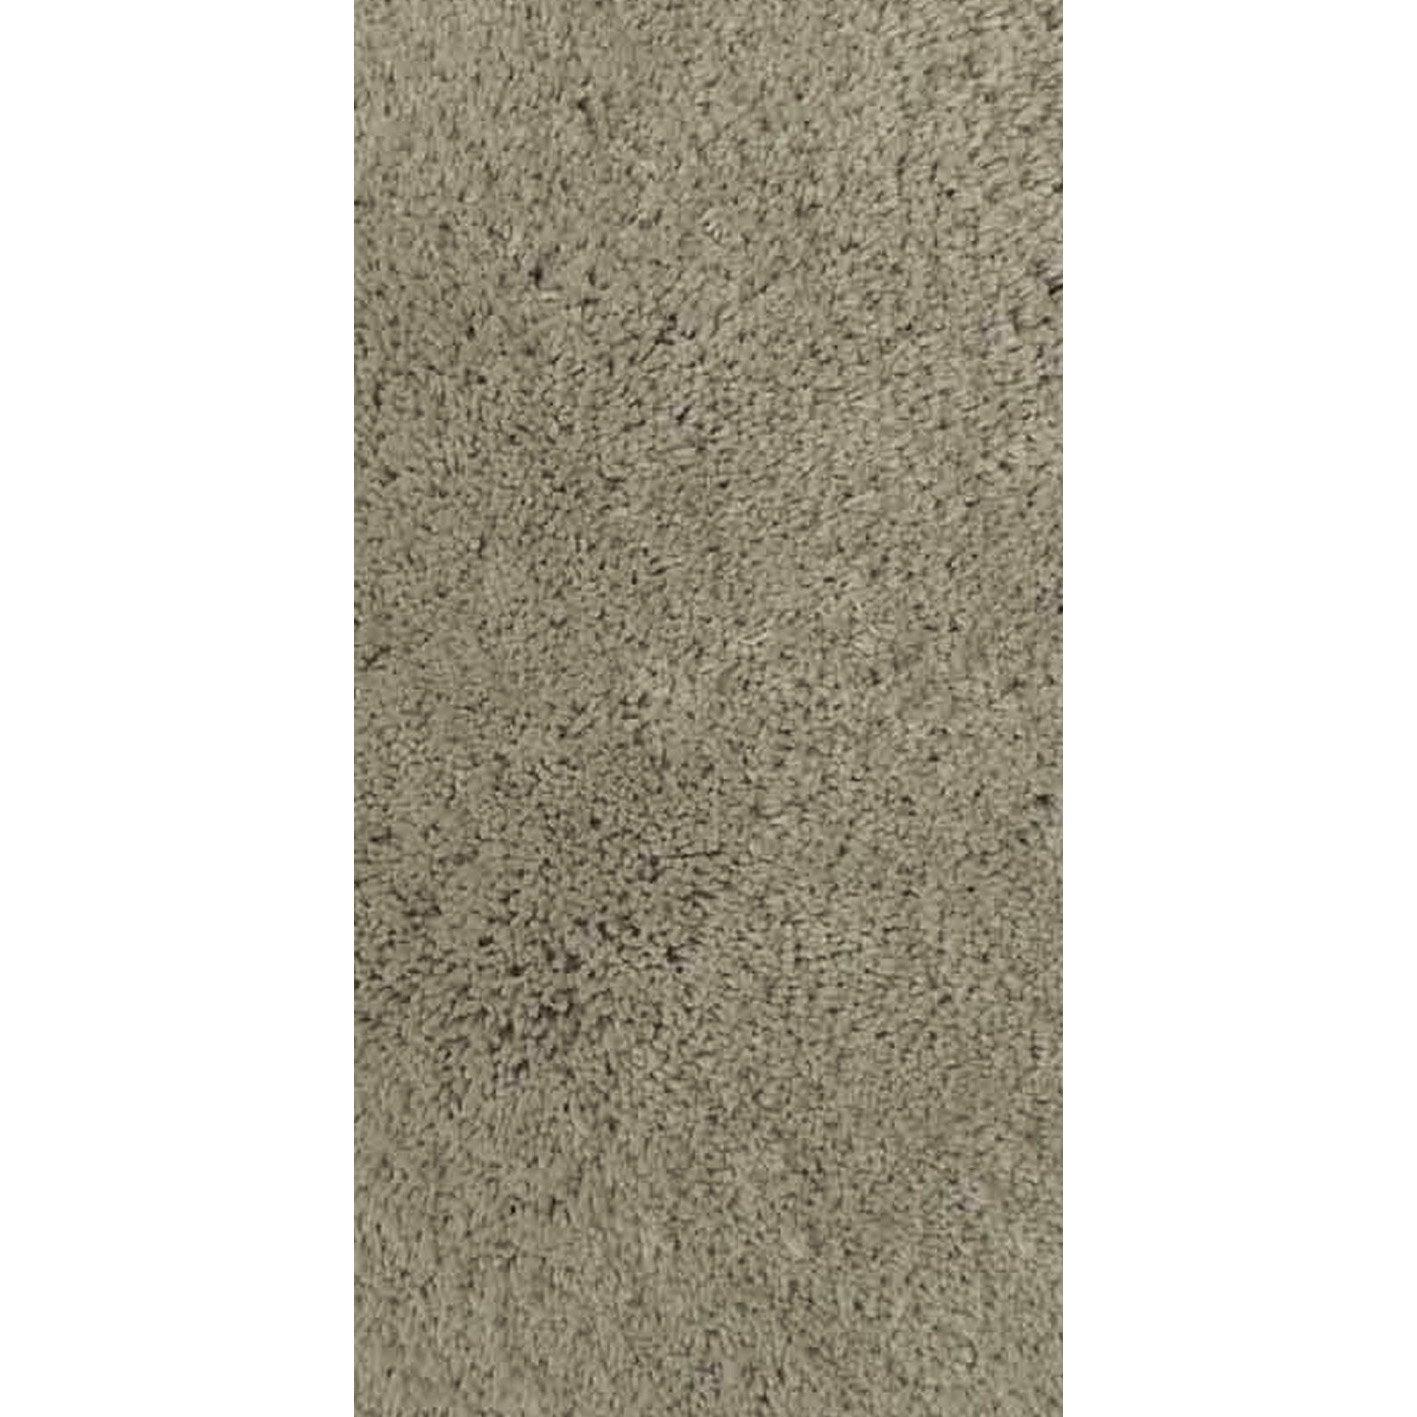 Tapis shaggy agathe gris galet n 6 120x60 cm leroy merlin - Galet leroy merlin ...